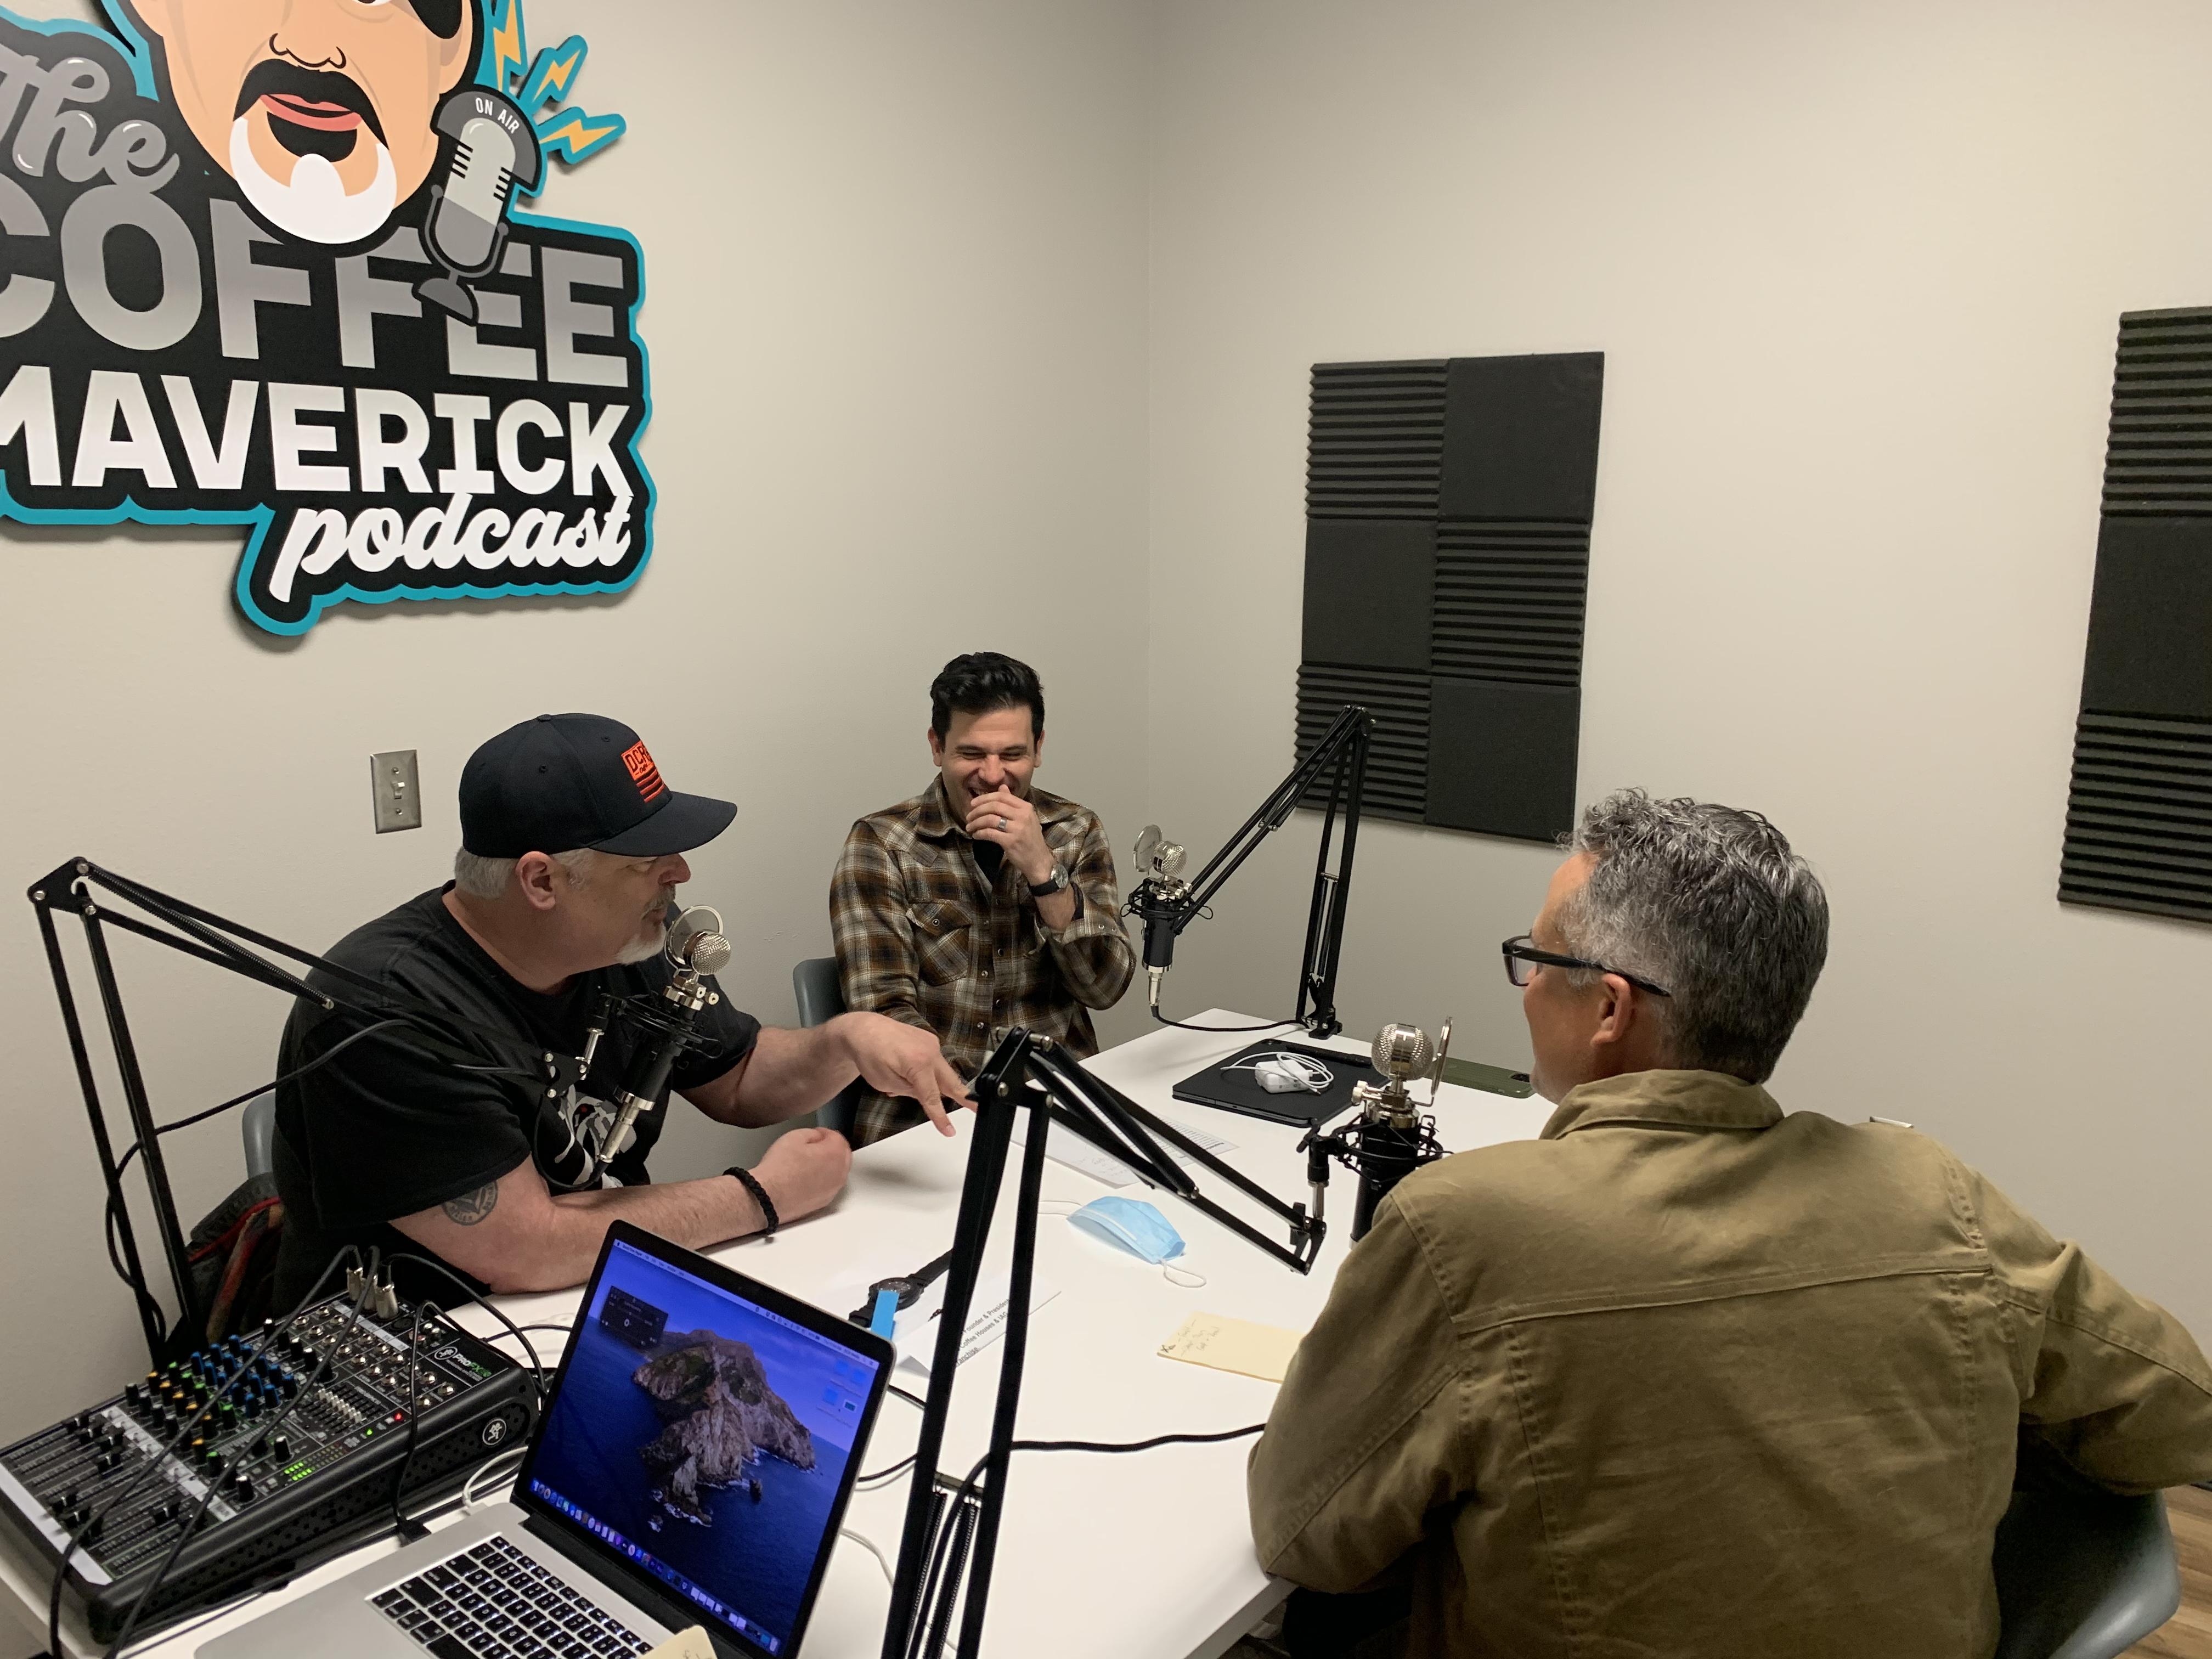 Chris Heyer on The DCR Coffee Podcast, Feb 2021